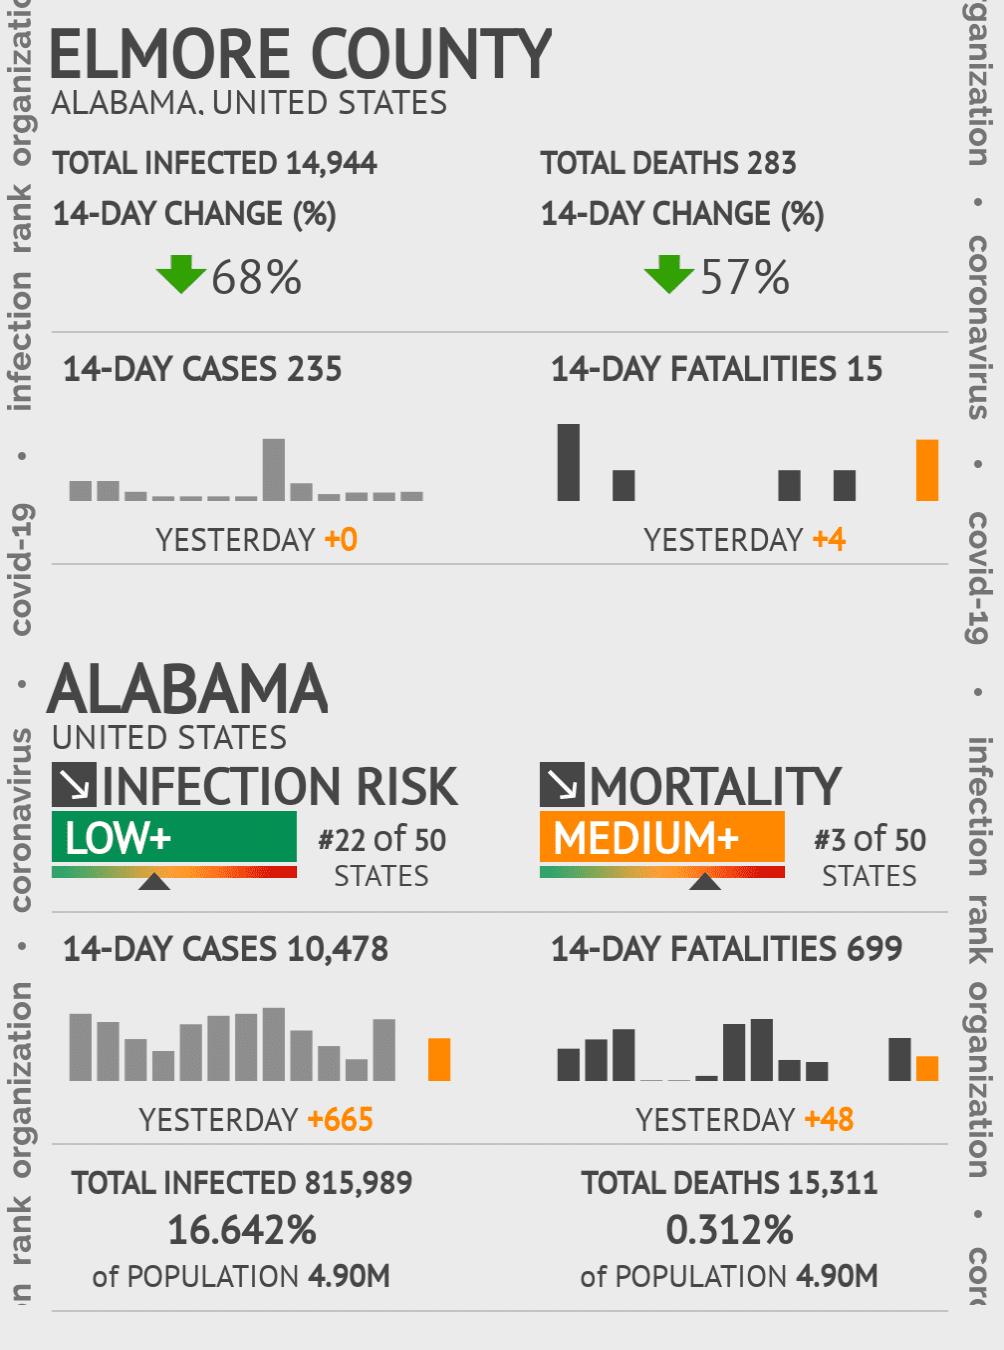 Elmore County Coronavirus Covid-19 Risk of Infection on July 24, 2021